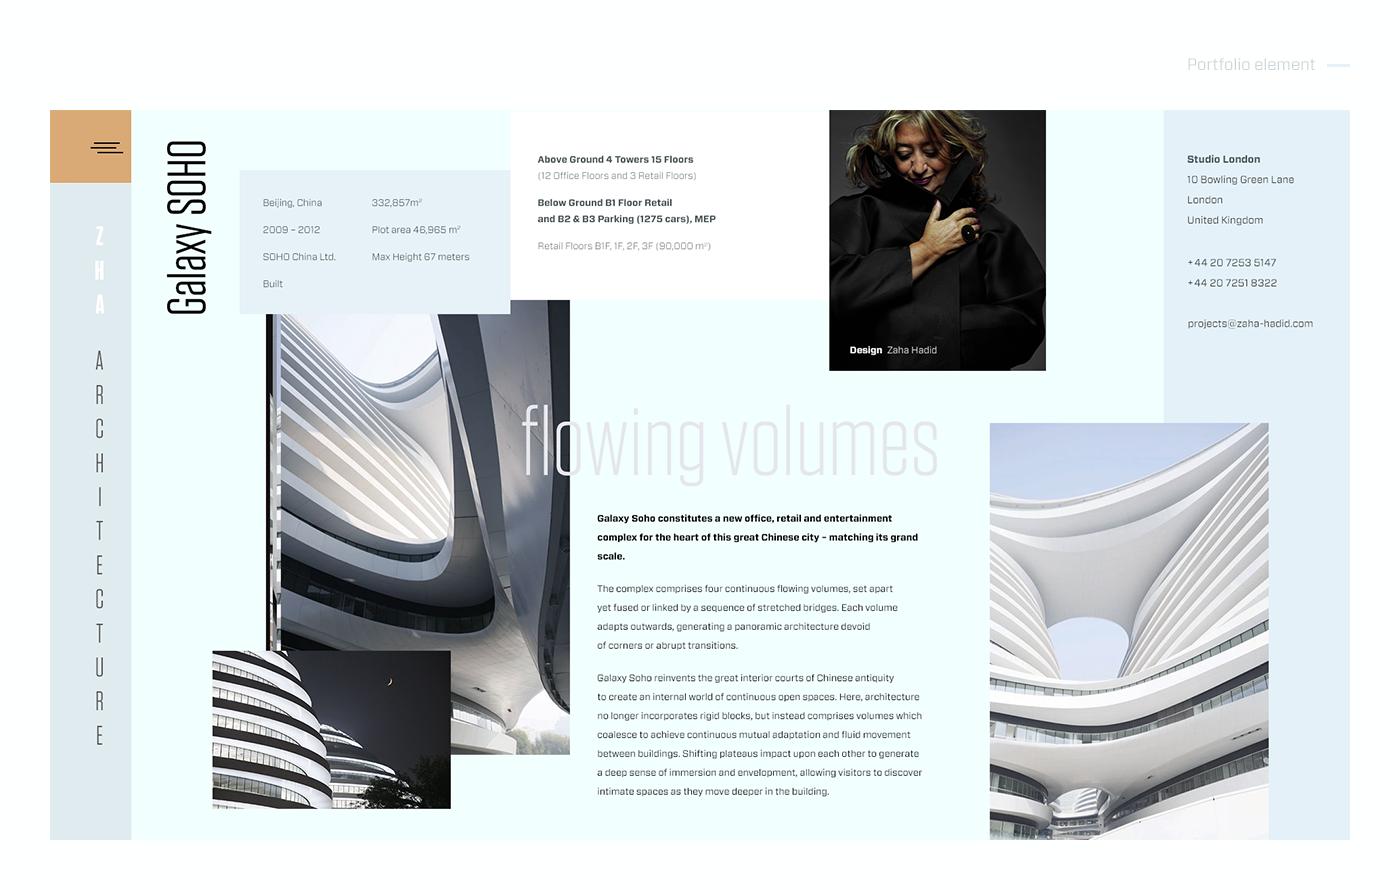 Zaha Hadid Architects Portfolio Element